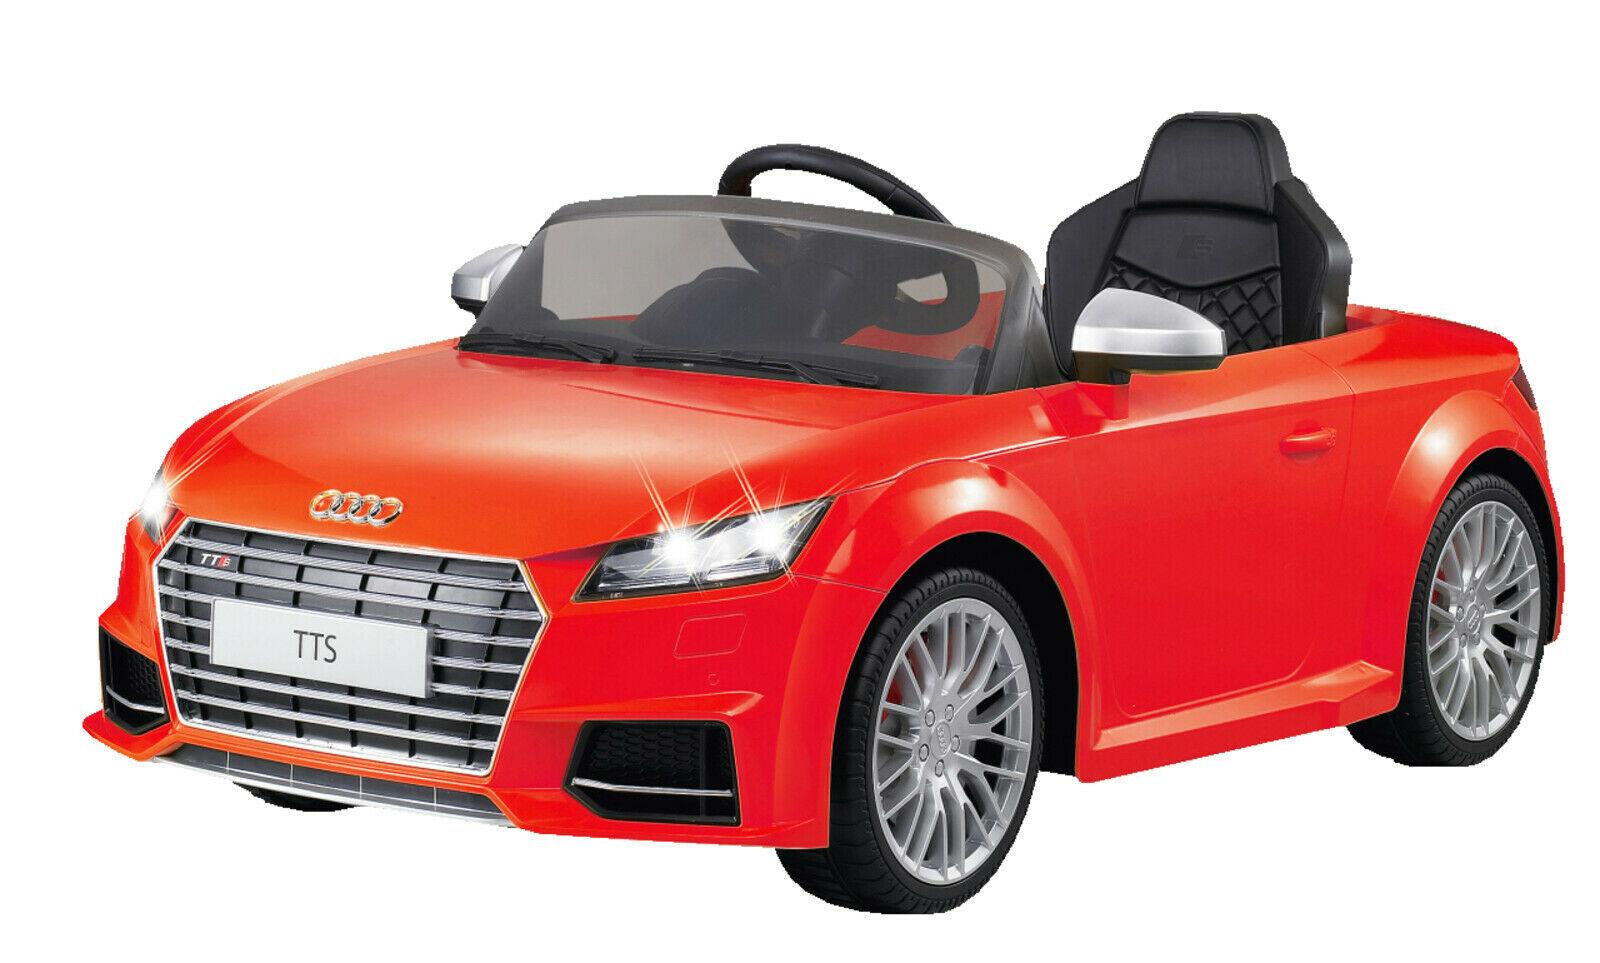 [Mediamarkt] JAMARA KIDS 405040 Audi TTS Roadster Ride-On Car, Rot